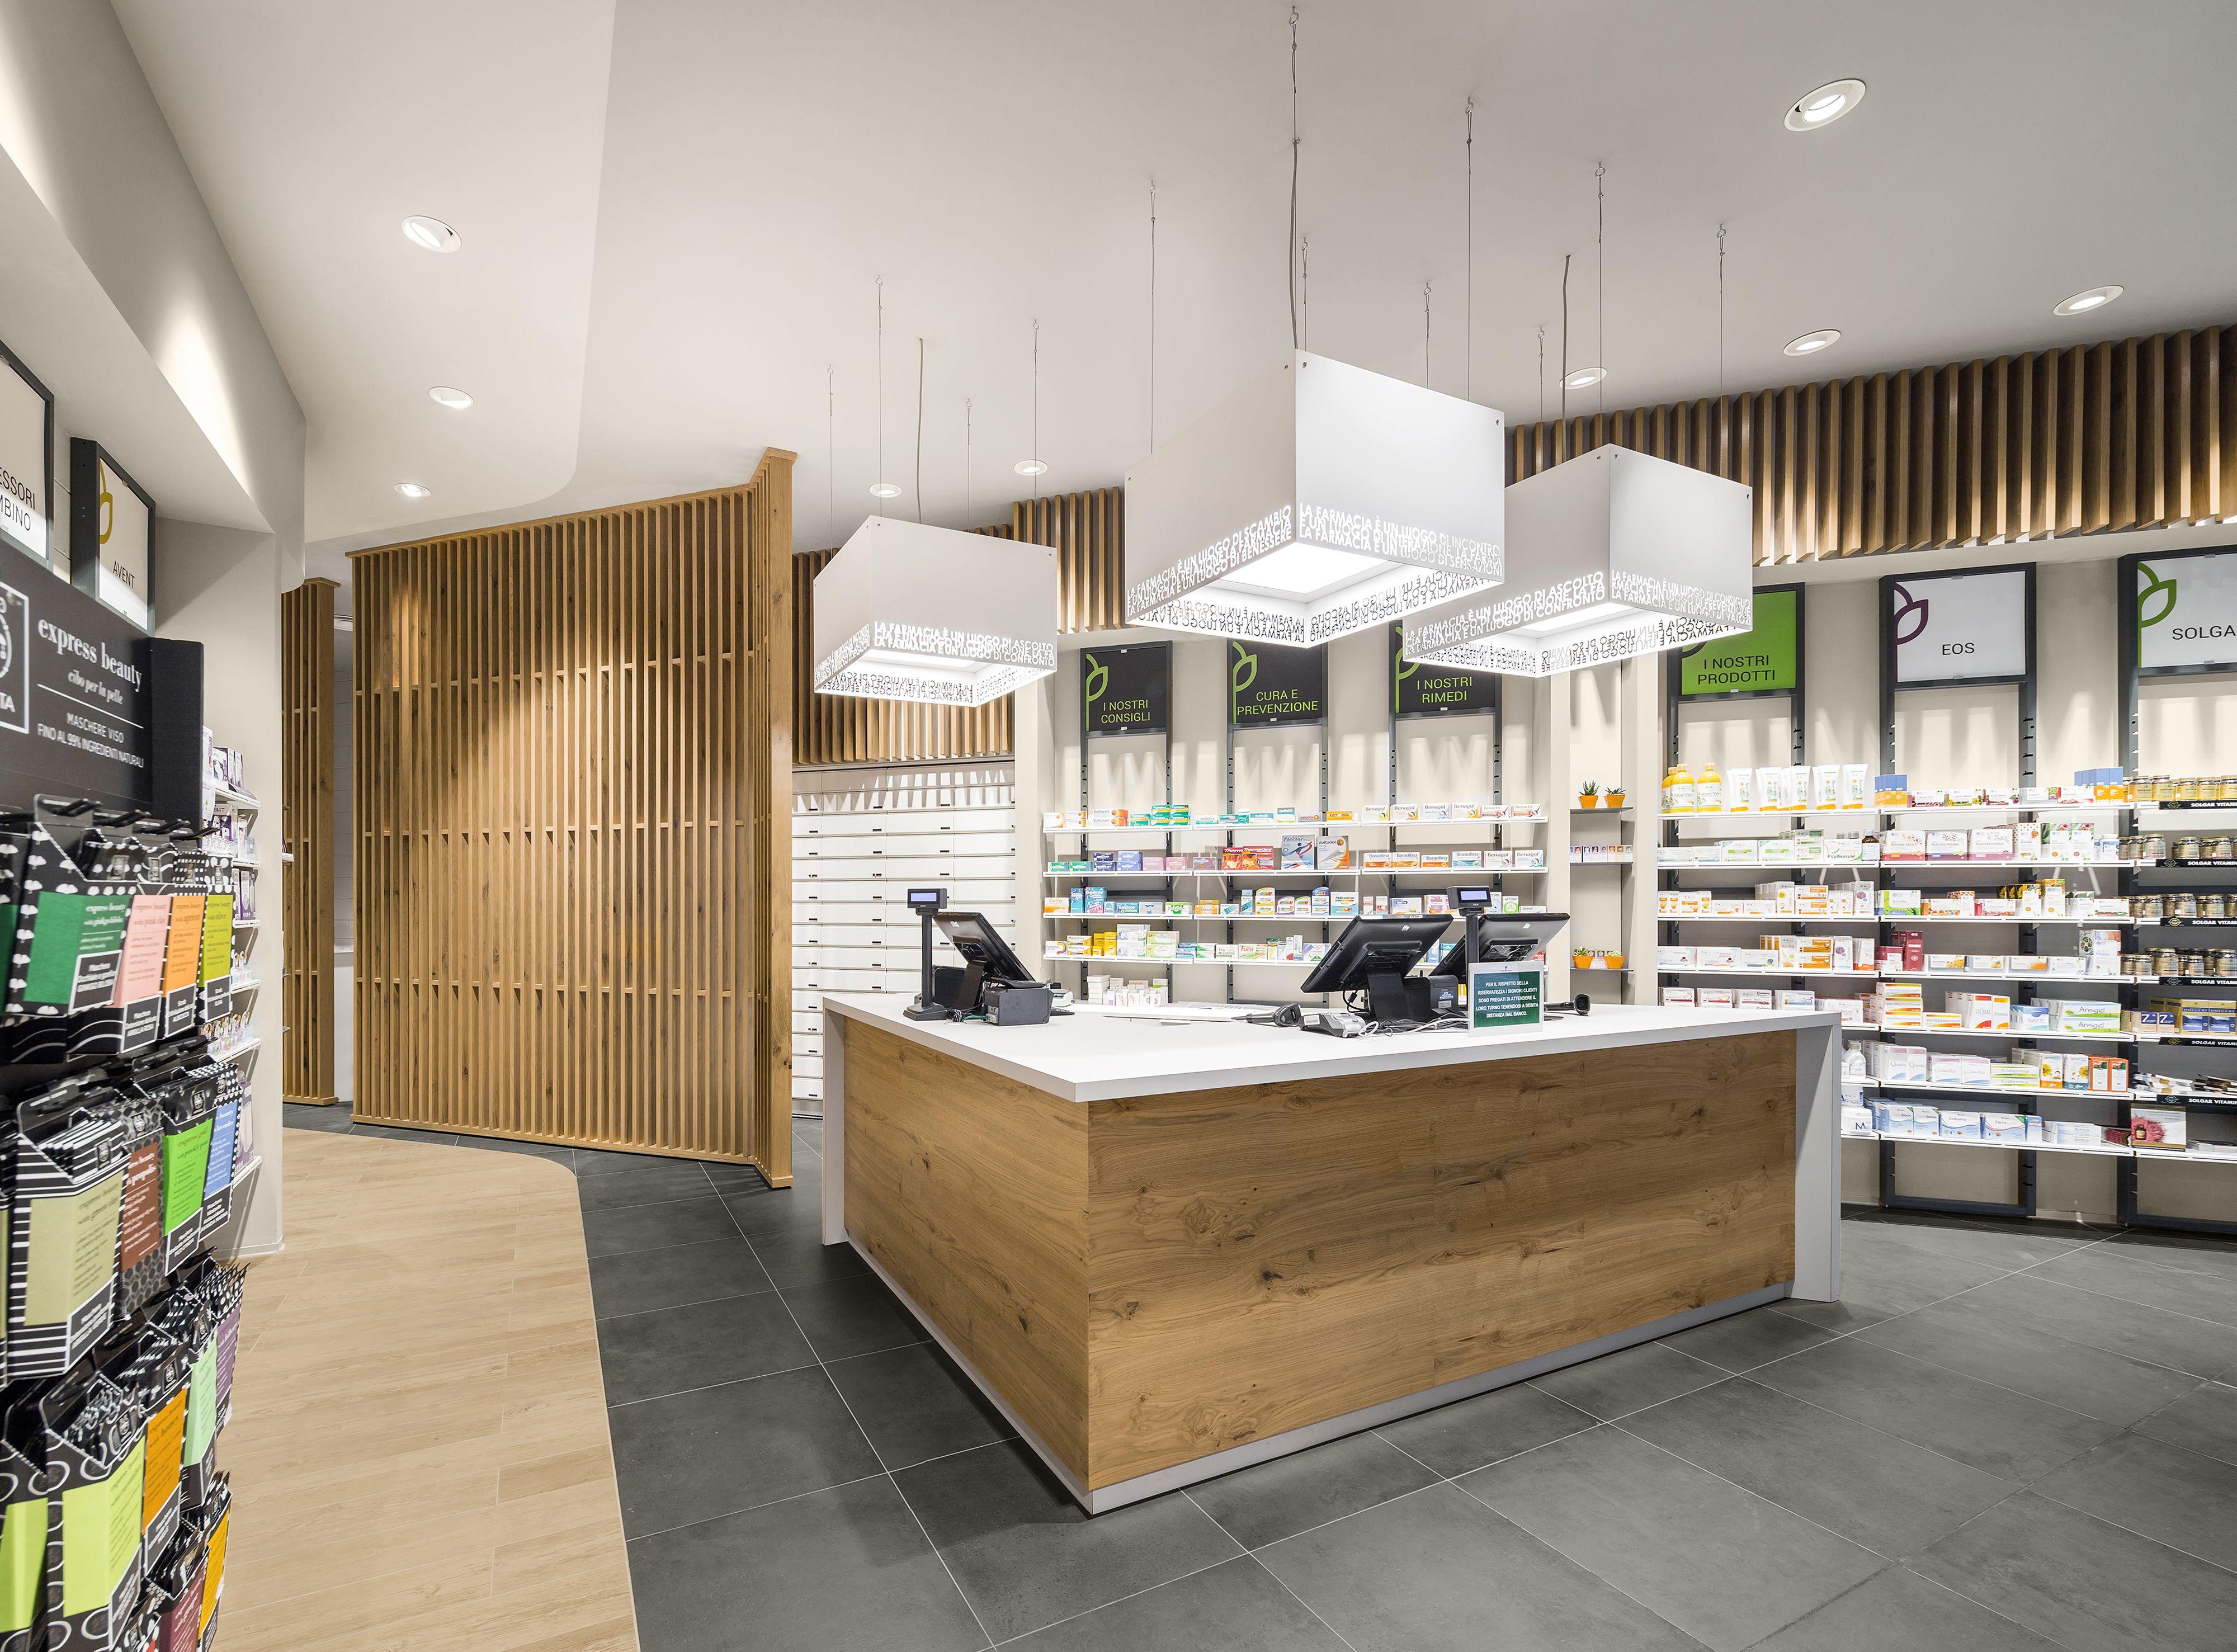 Farmacia riva by amlab pharmacy design retail design store design pharmacy shelving